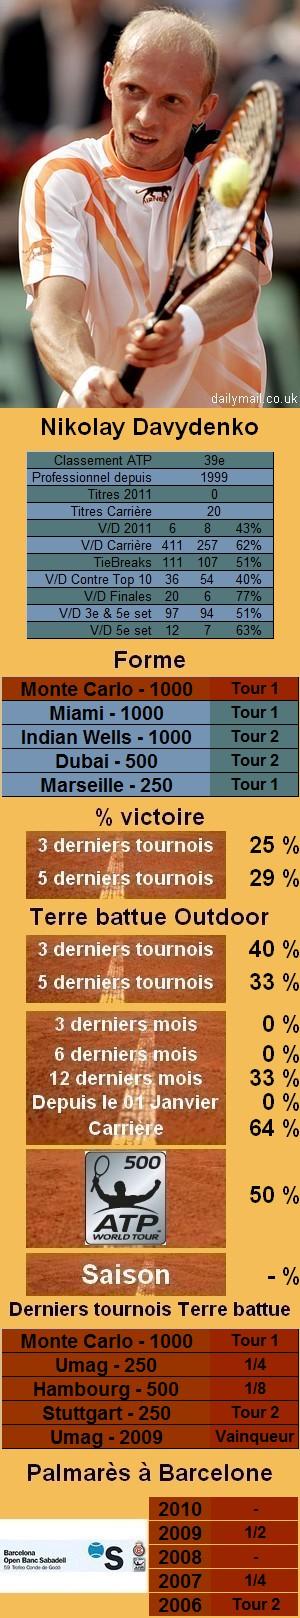 Les statistiques tennis de Nikolay Davydenko pour le tournoi de Barcelone